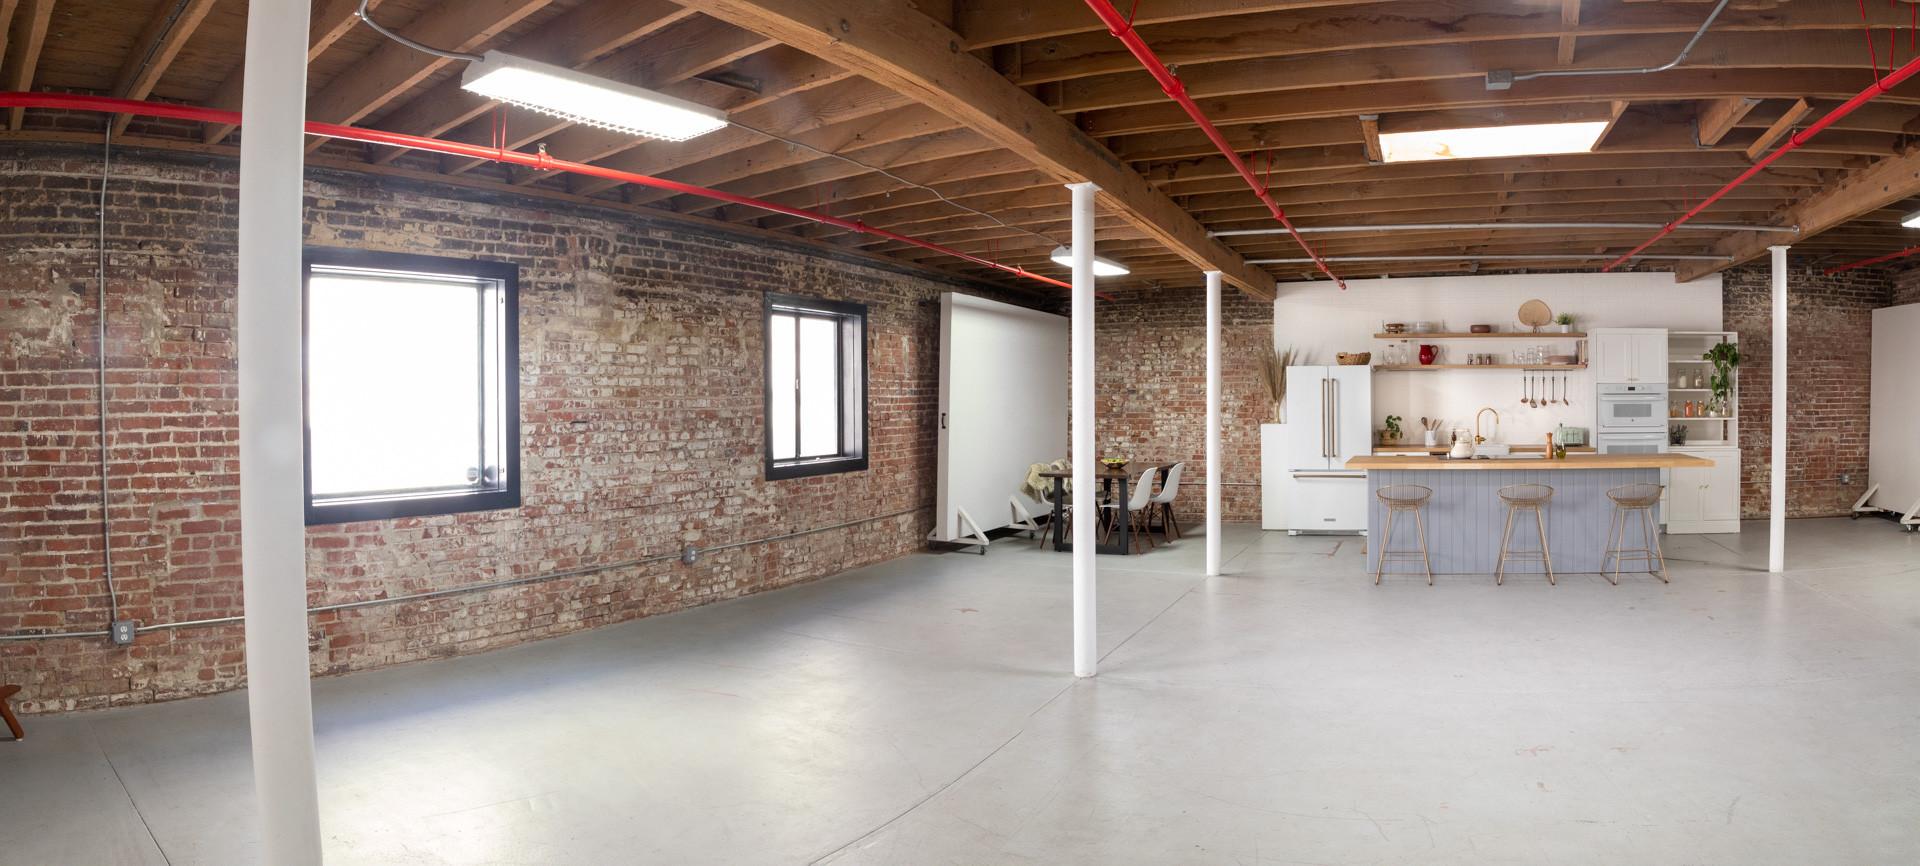 Jikoni Studios Kitchen Studio Rental.jpg